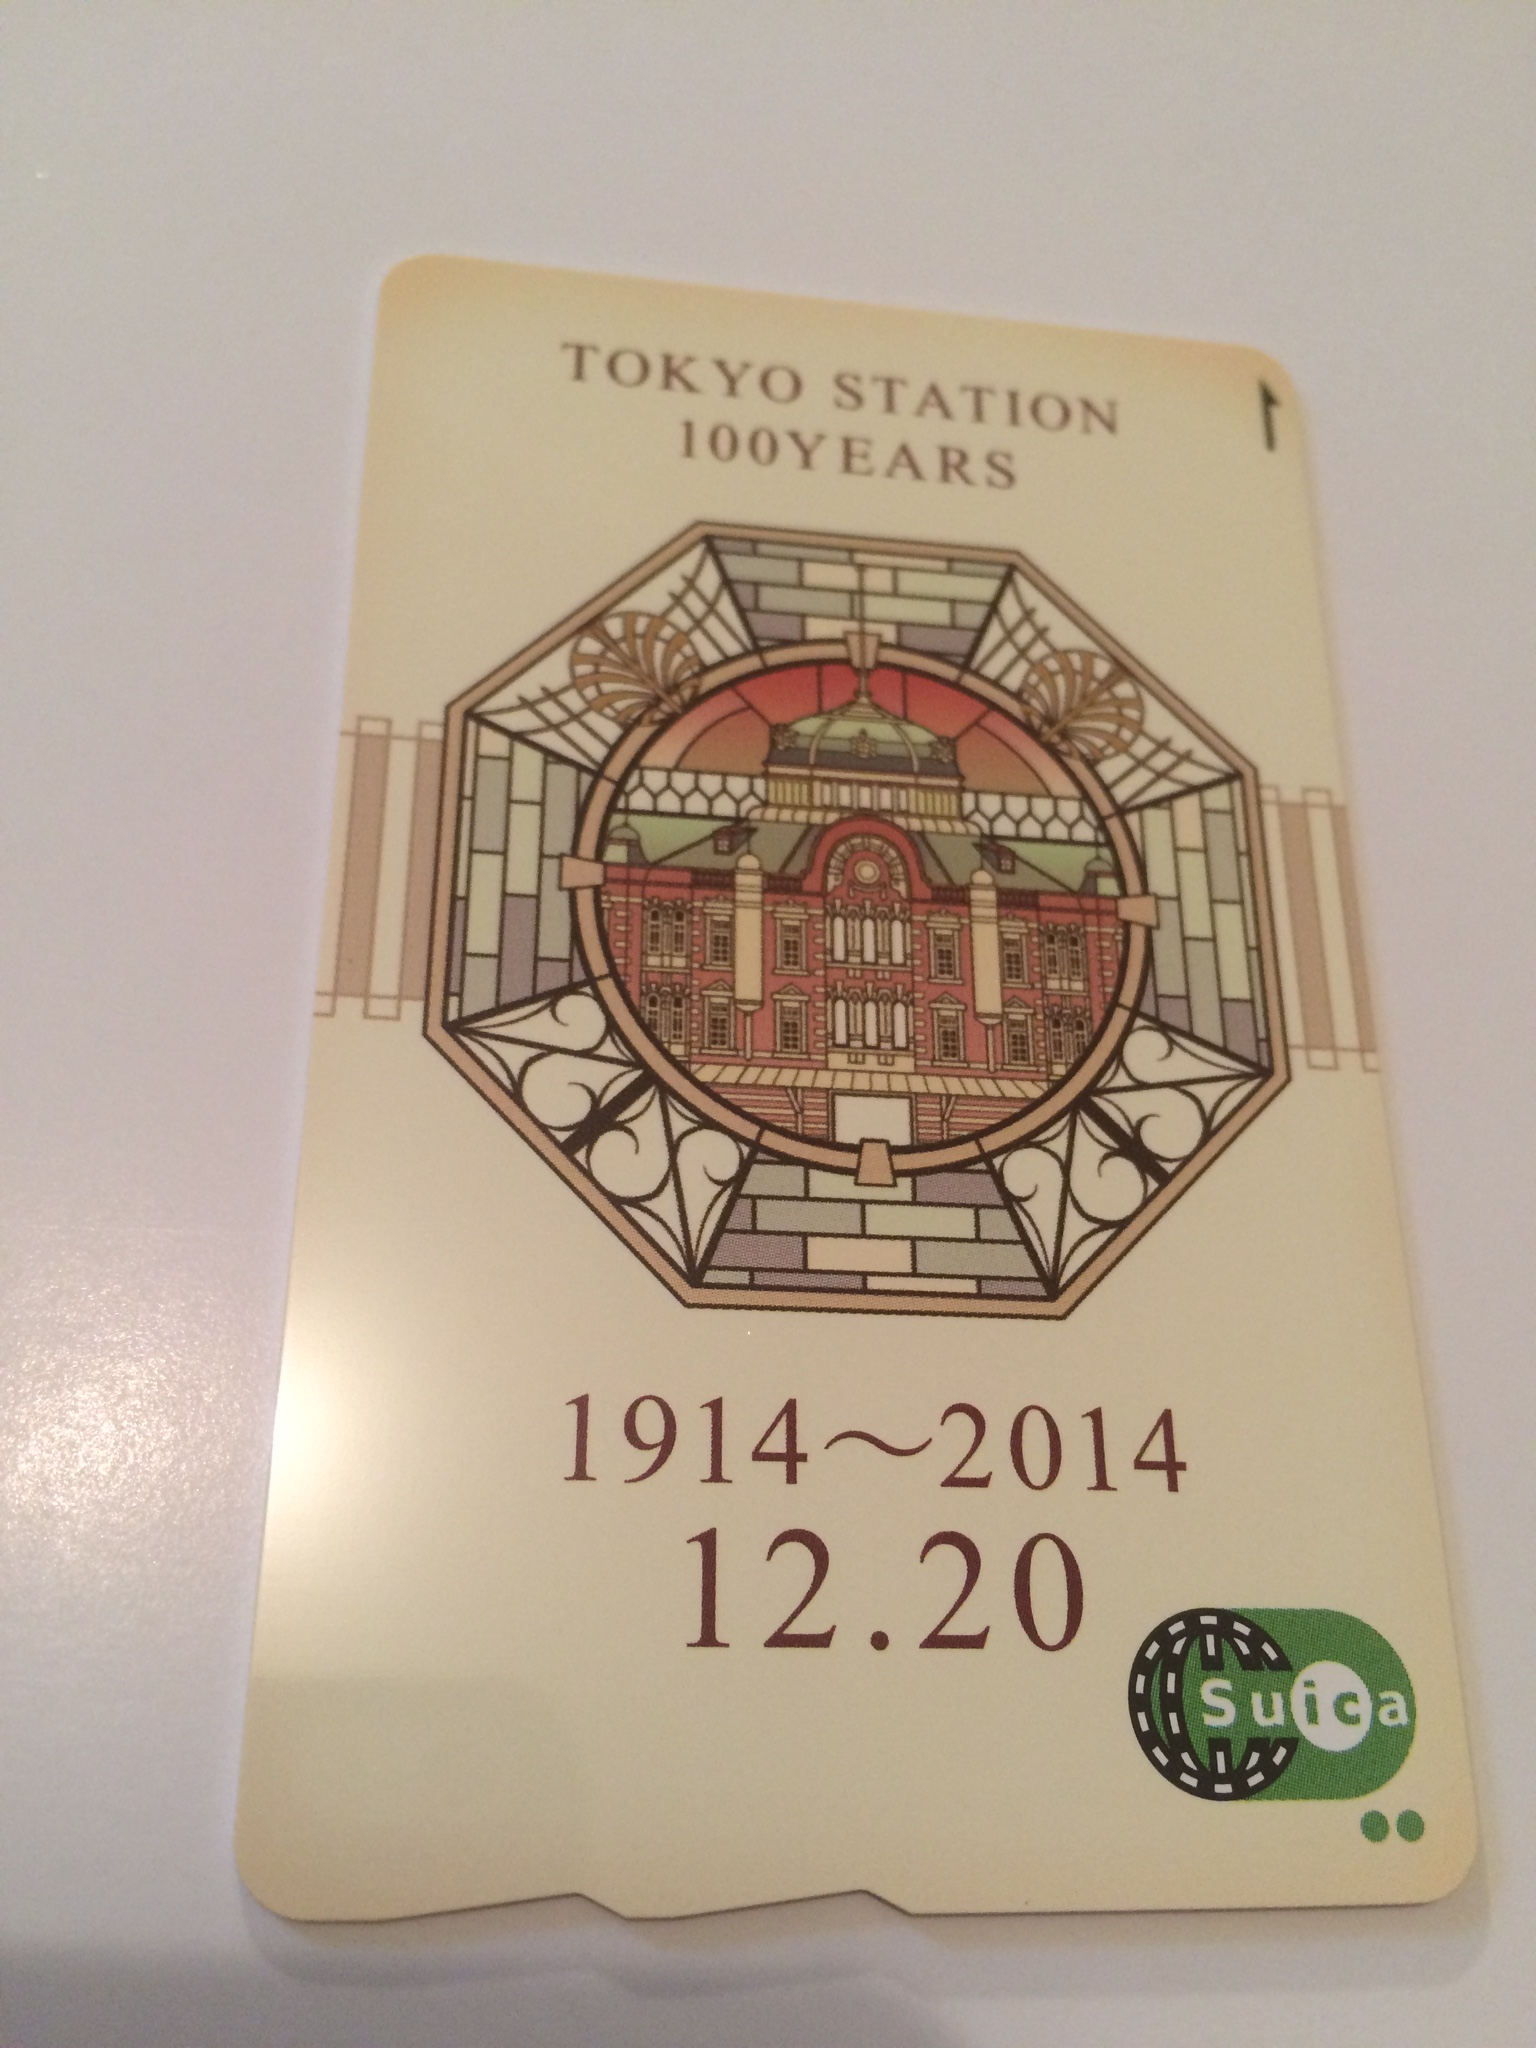 東京駅100周年 Suica